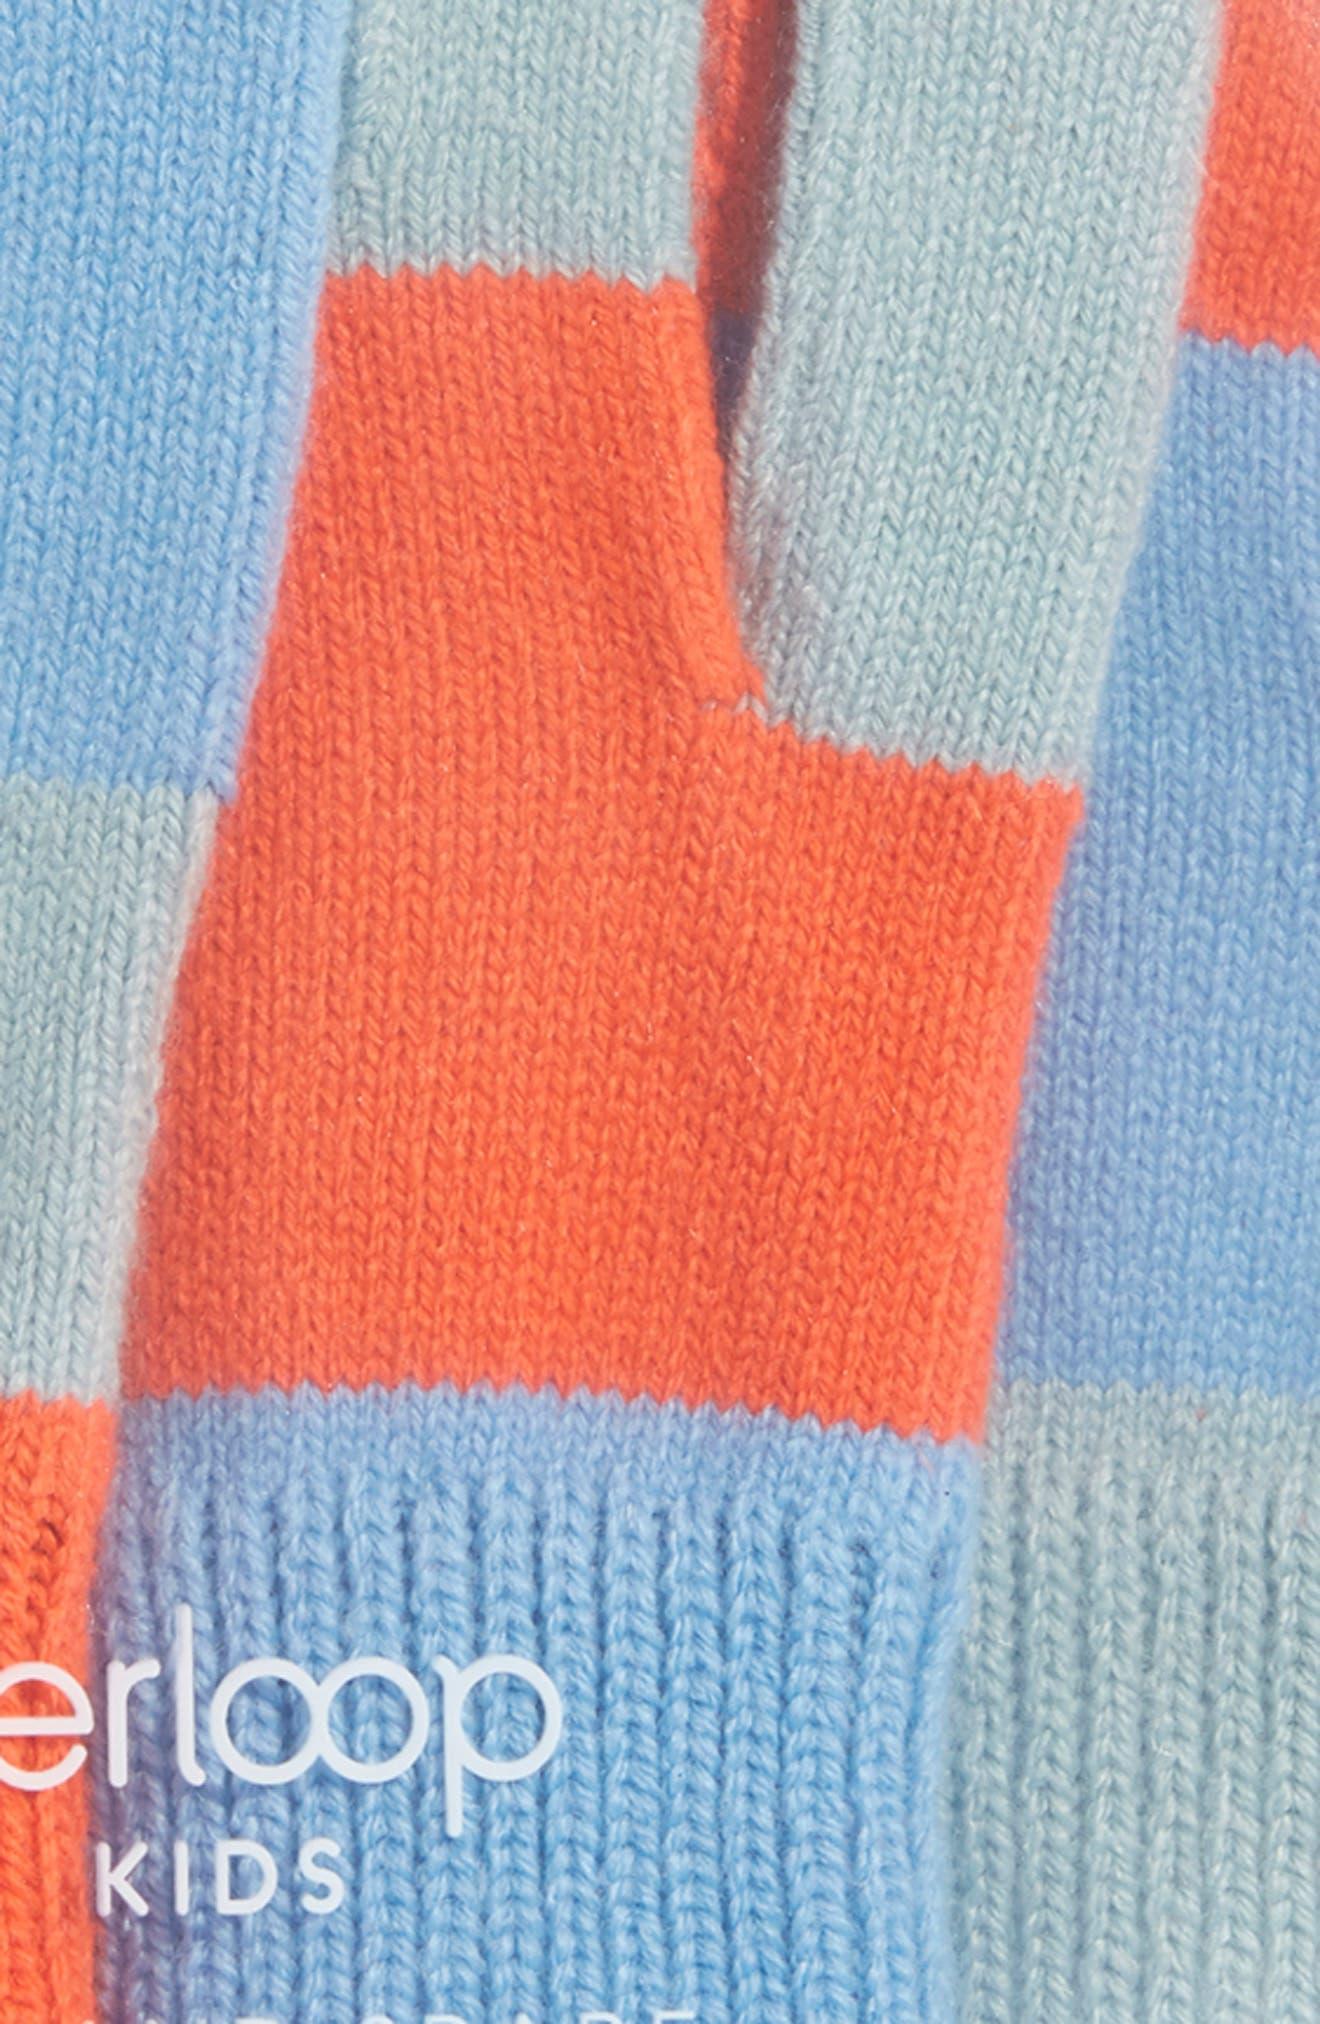 Pair & Spare Set of 3 Touchscreen Gloves,                             Alternate thumbnail 2, color,                             BLUES ORANGE